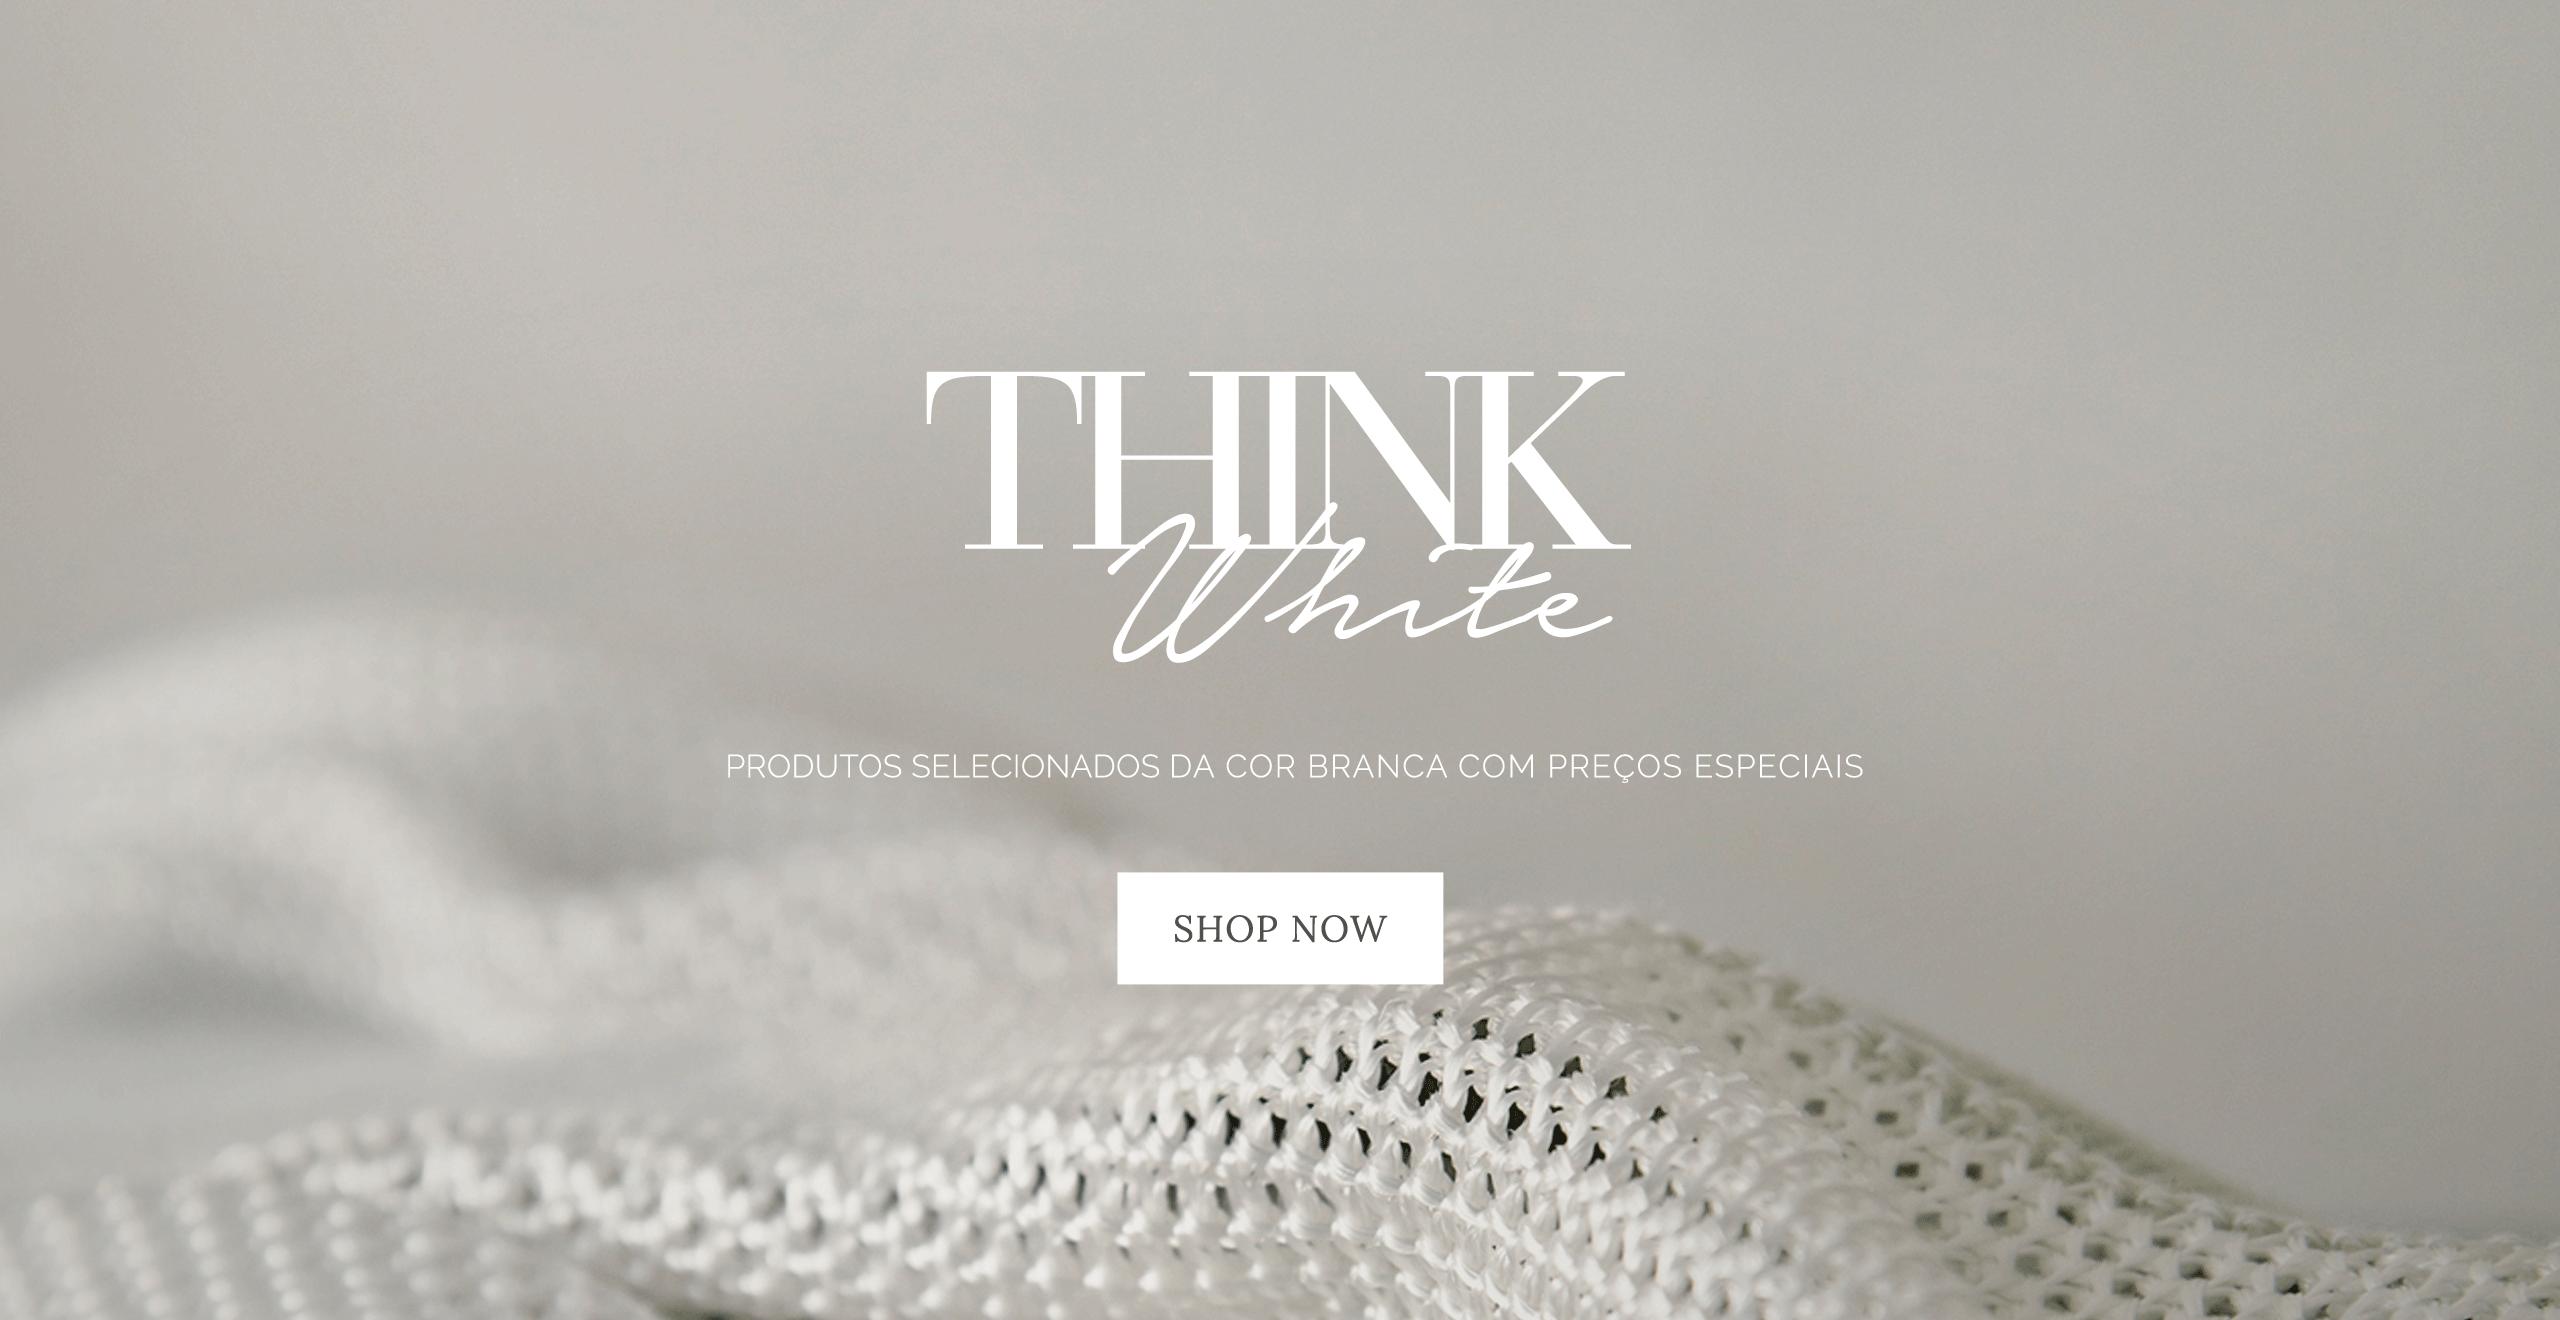 ThinkWhite_1311